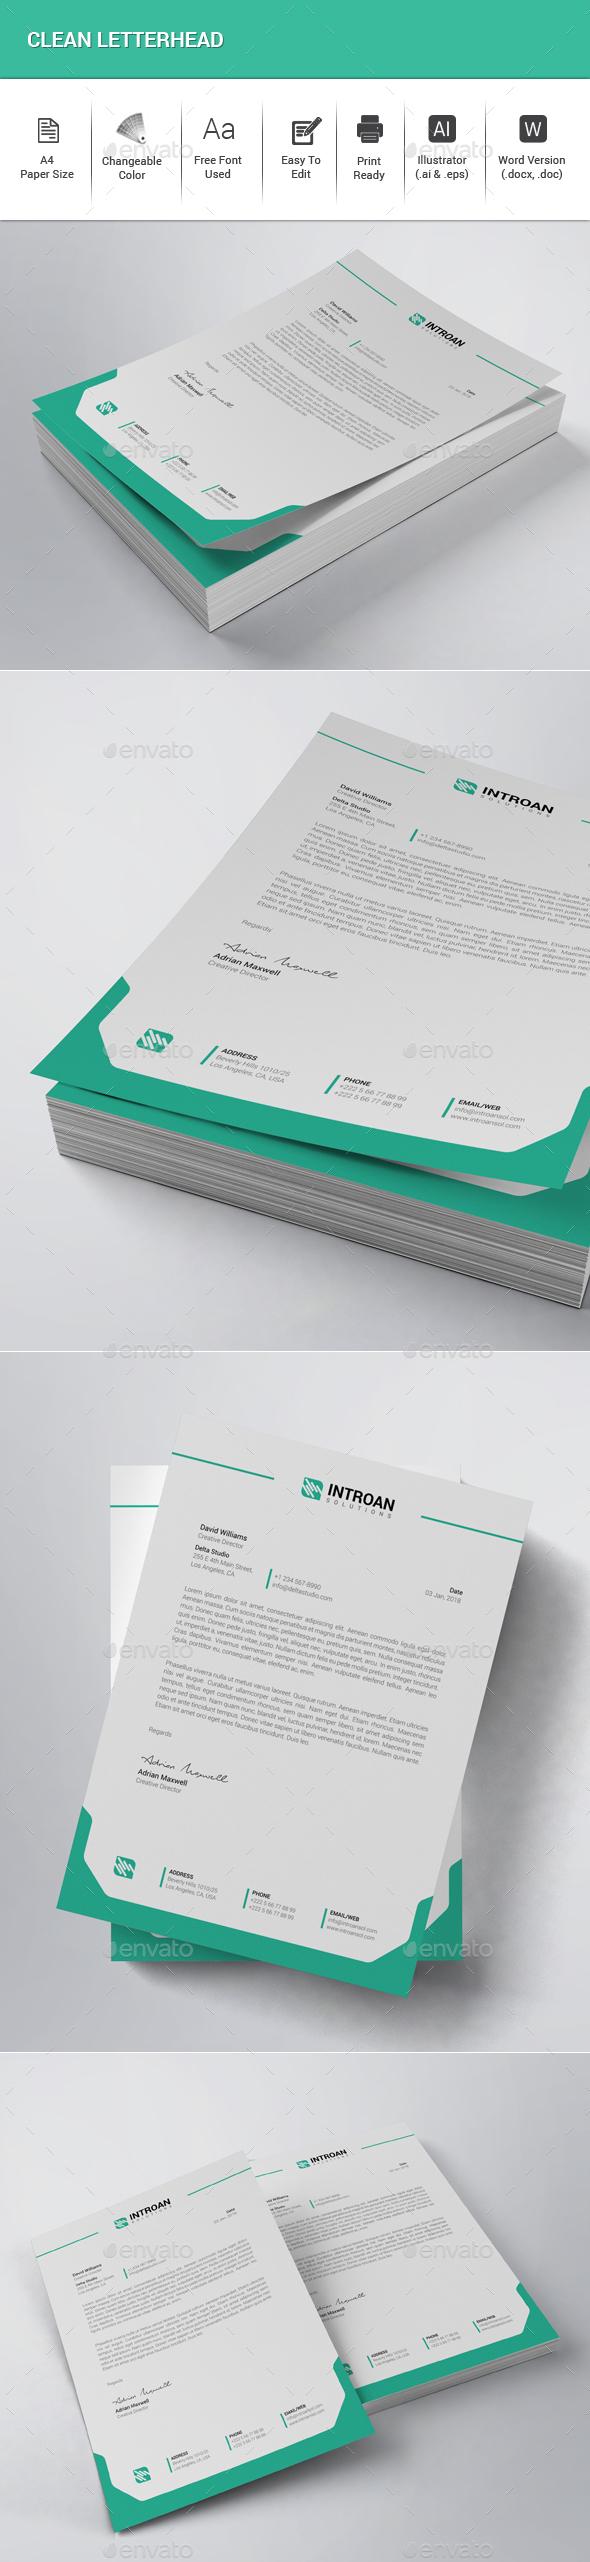 Clean Letterhead - Stationery Print Templates